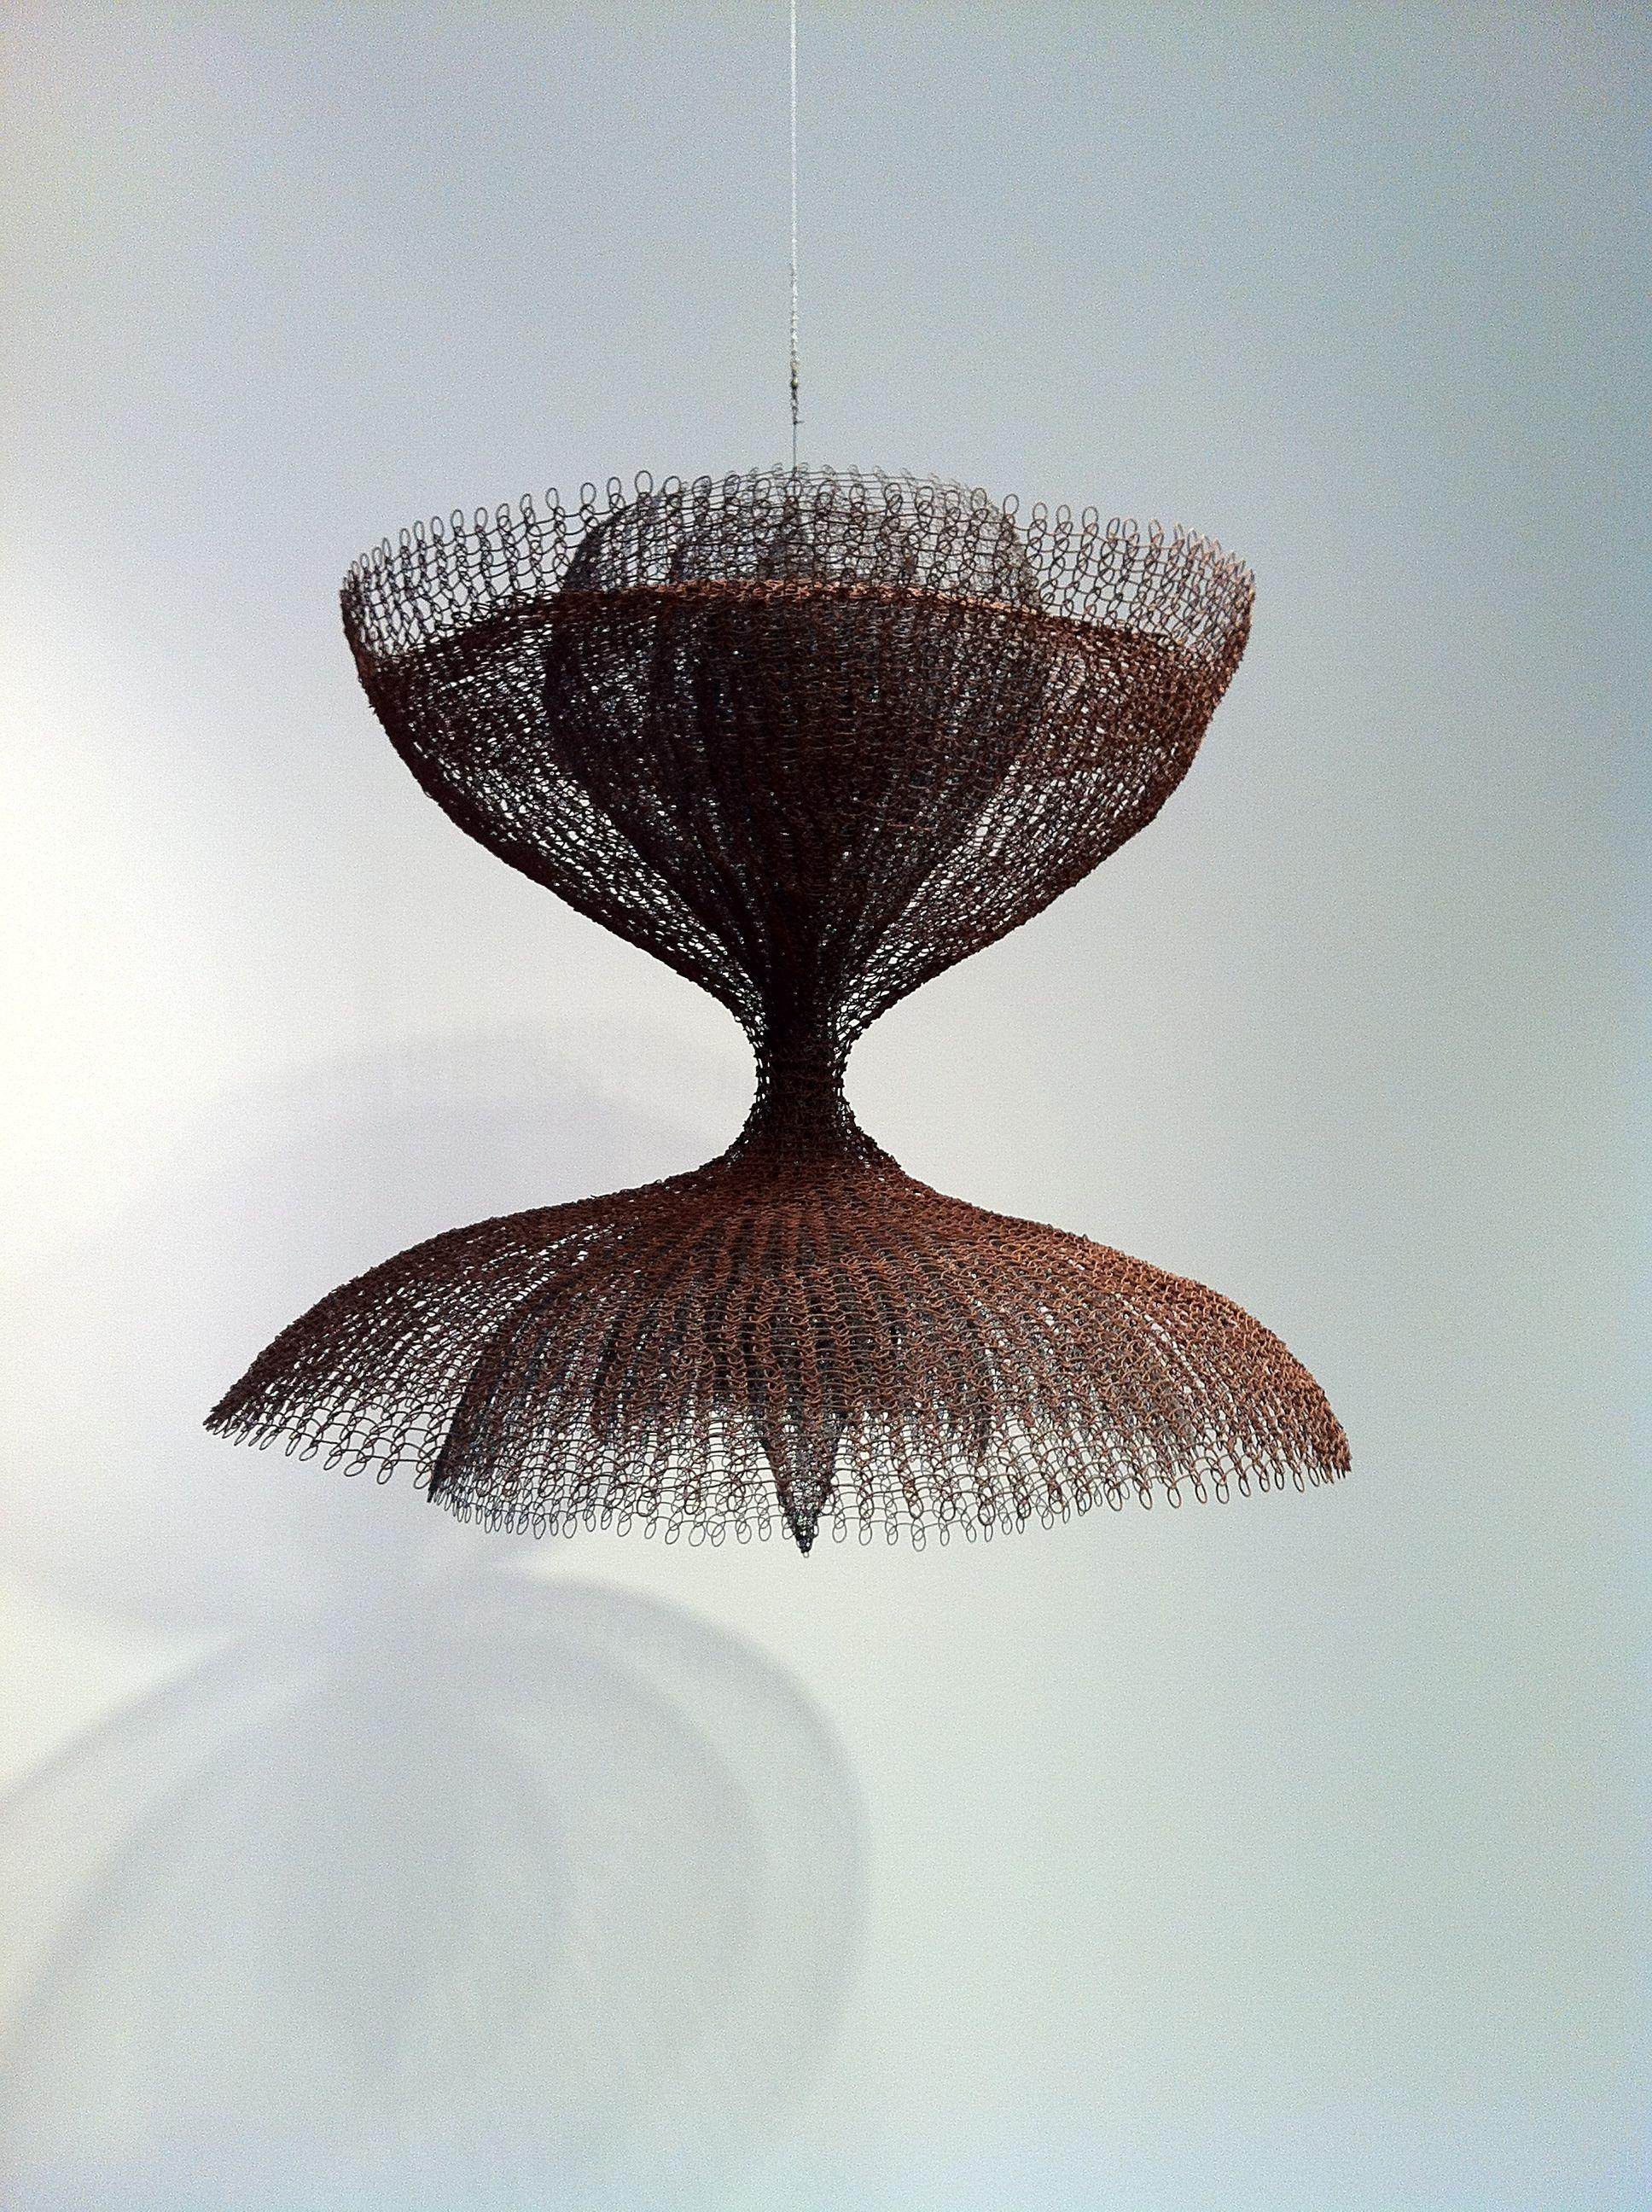 Ruth Asawa at Christie\'s | Ruth Asawa | Pinterest | Artwork